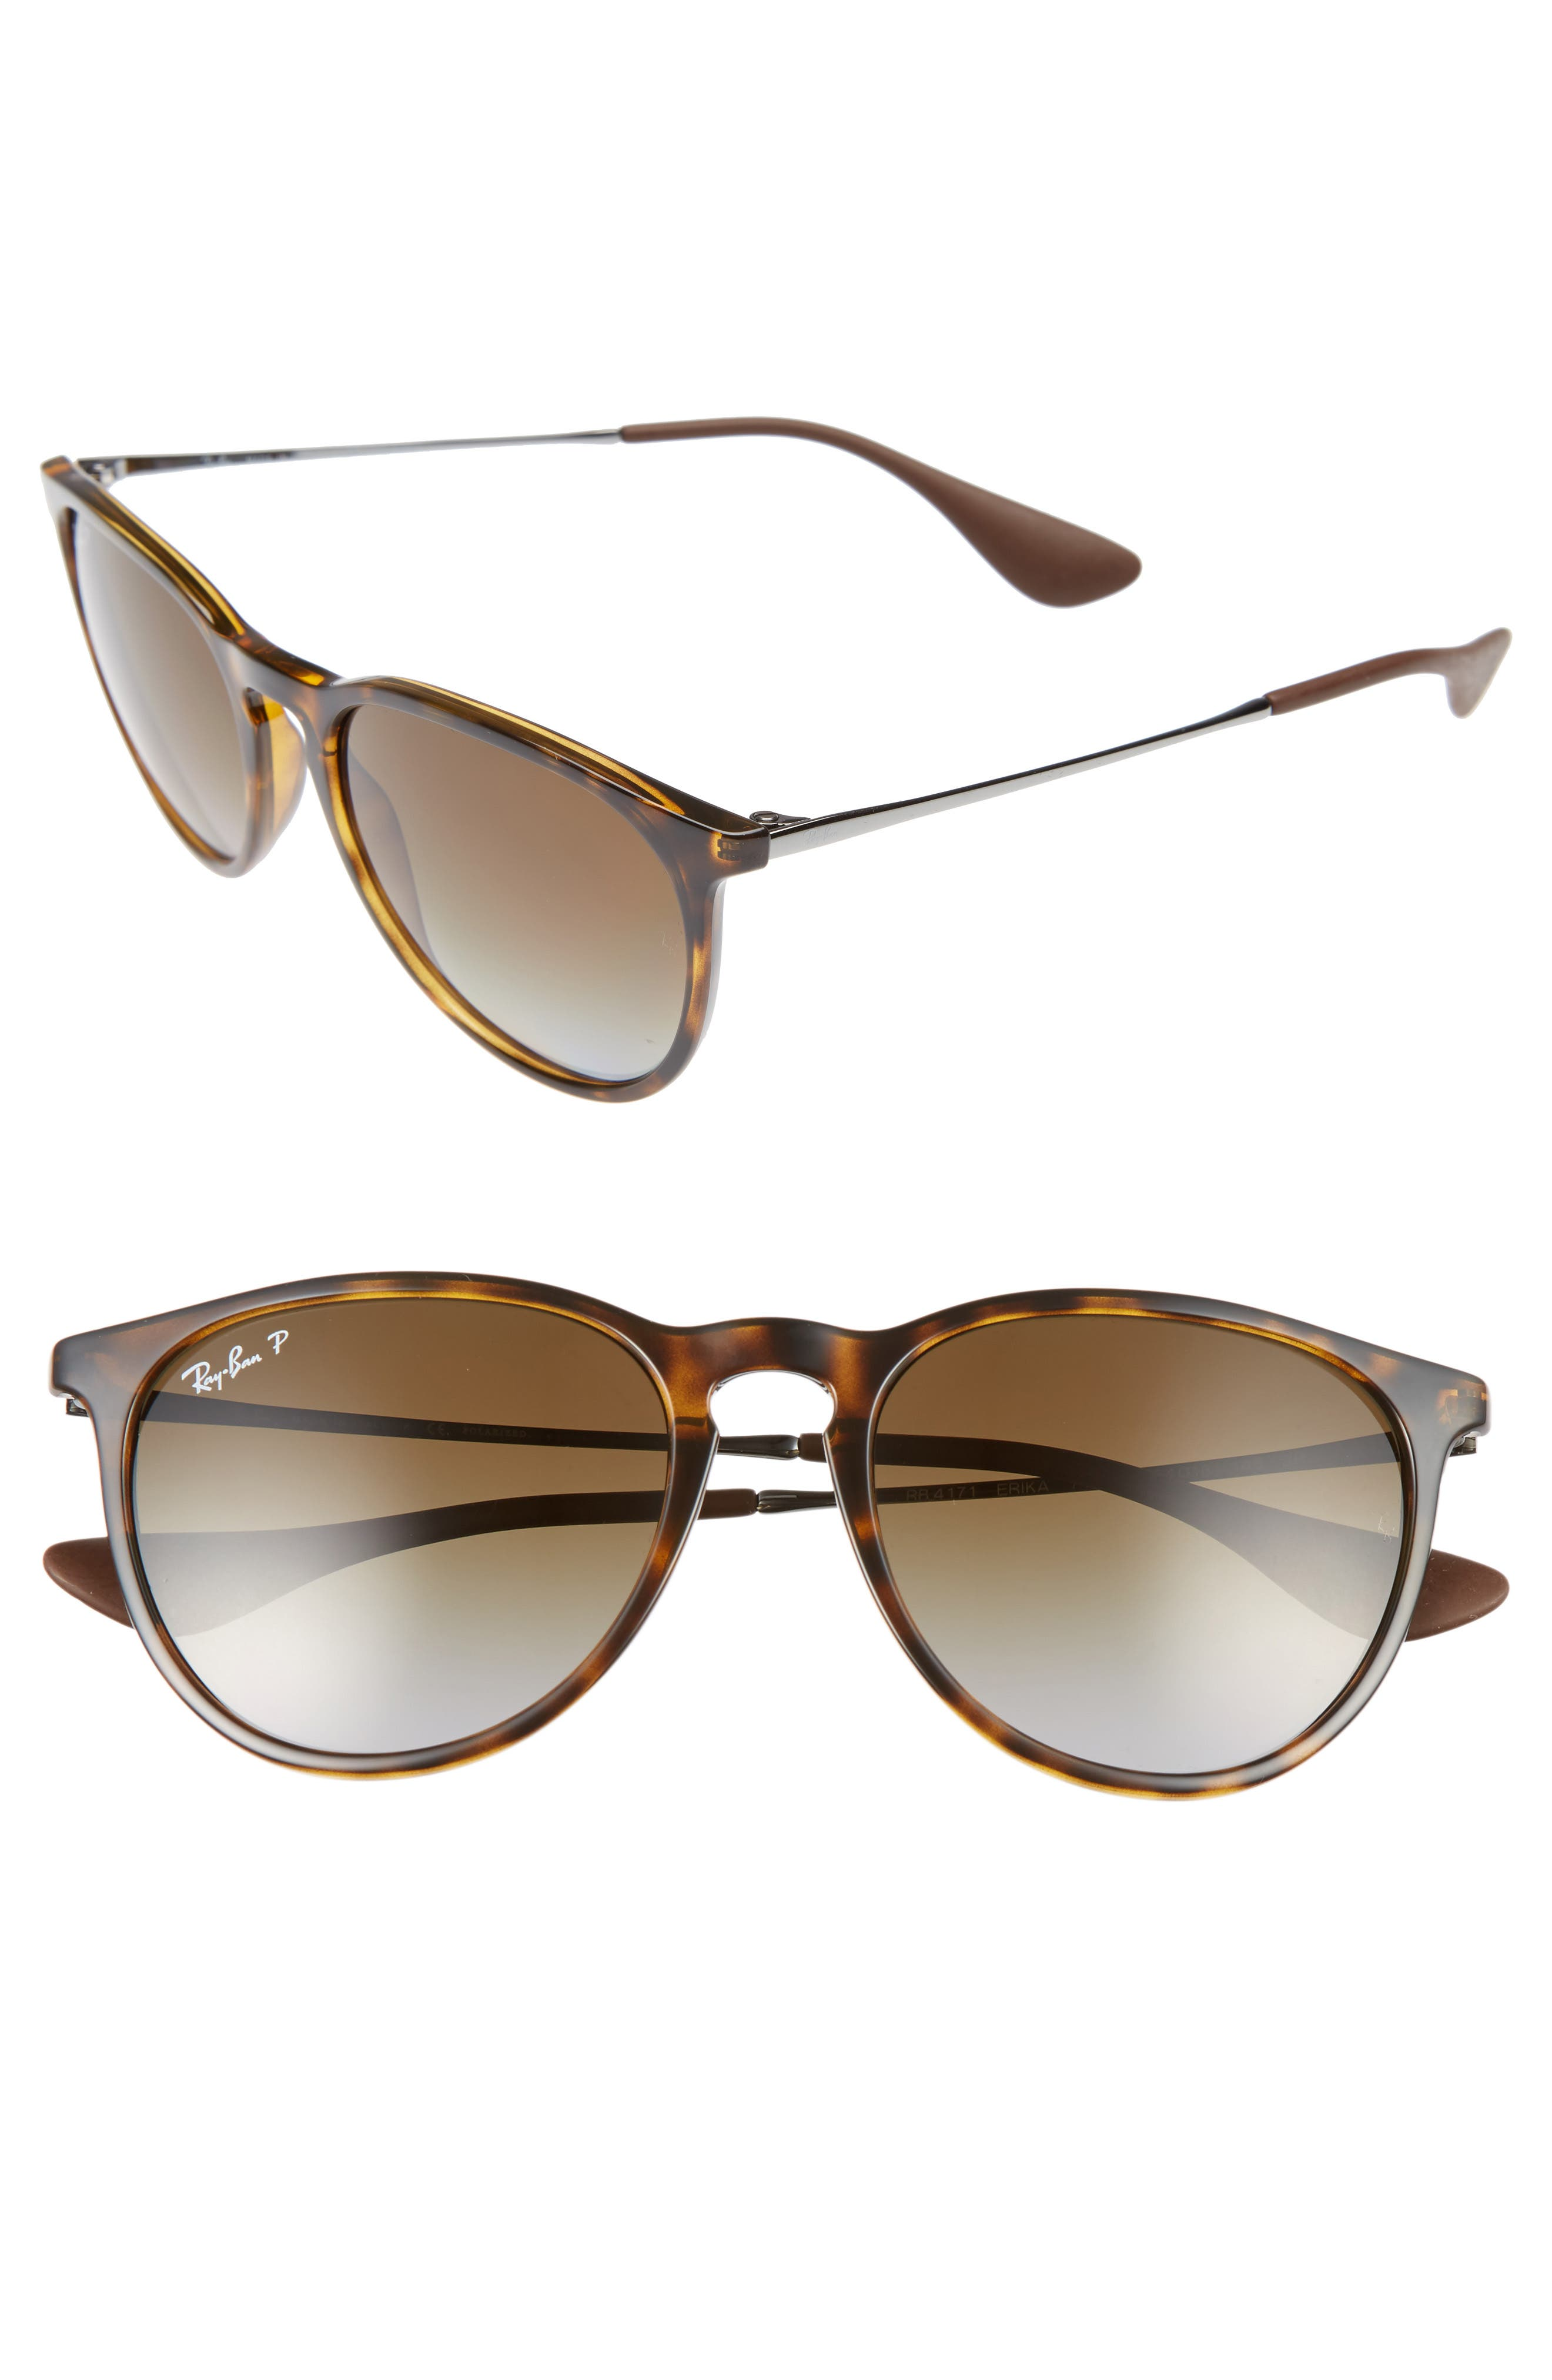 Erika Classic 54mm Sunglasses,                             Alternate thumbnail 2, color,                             HAVANA